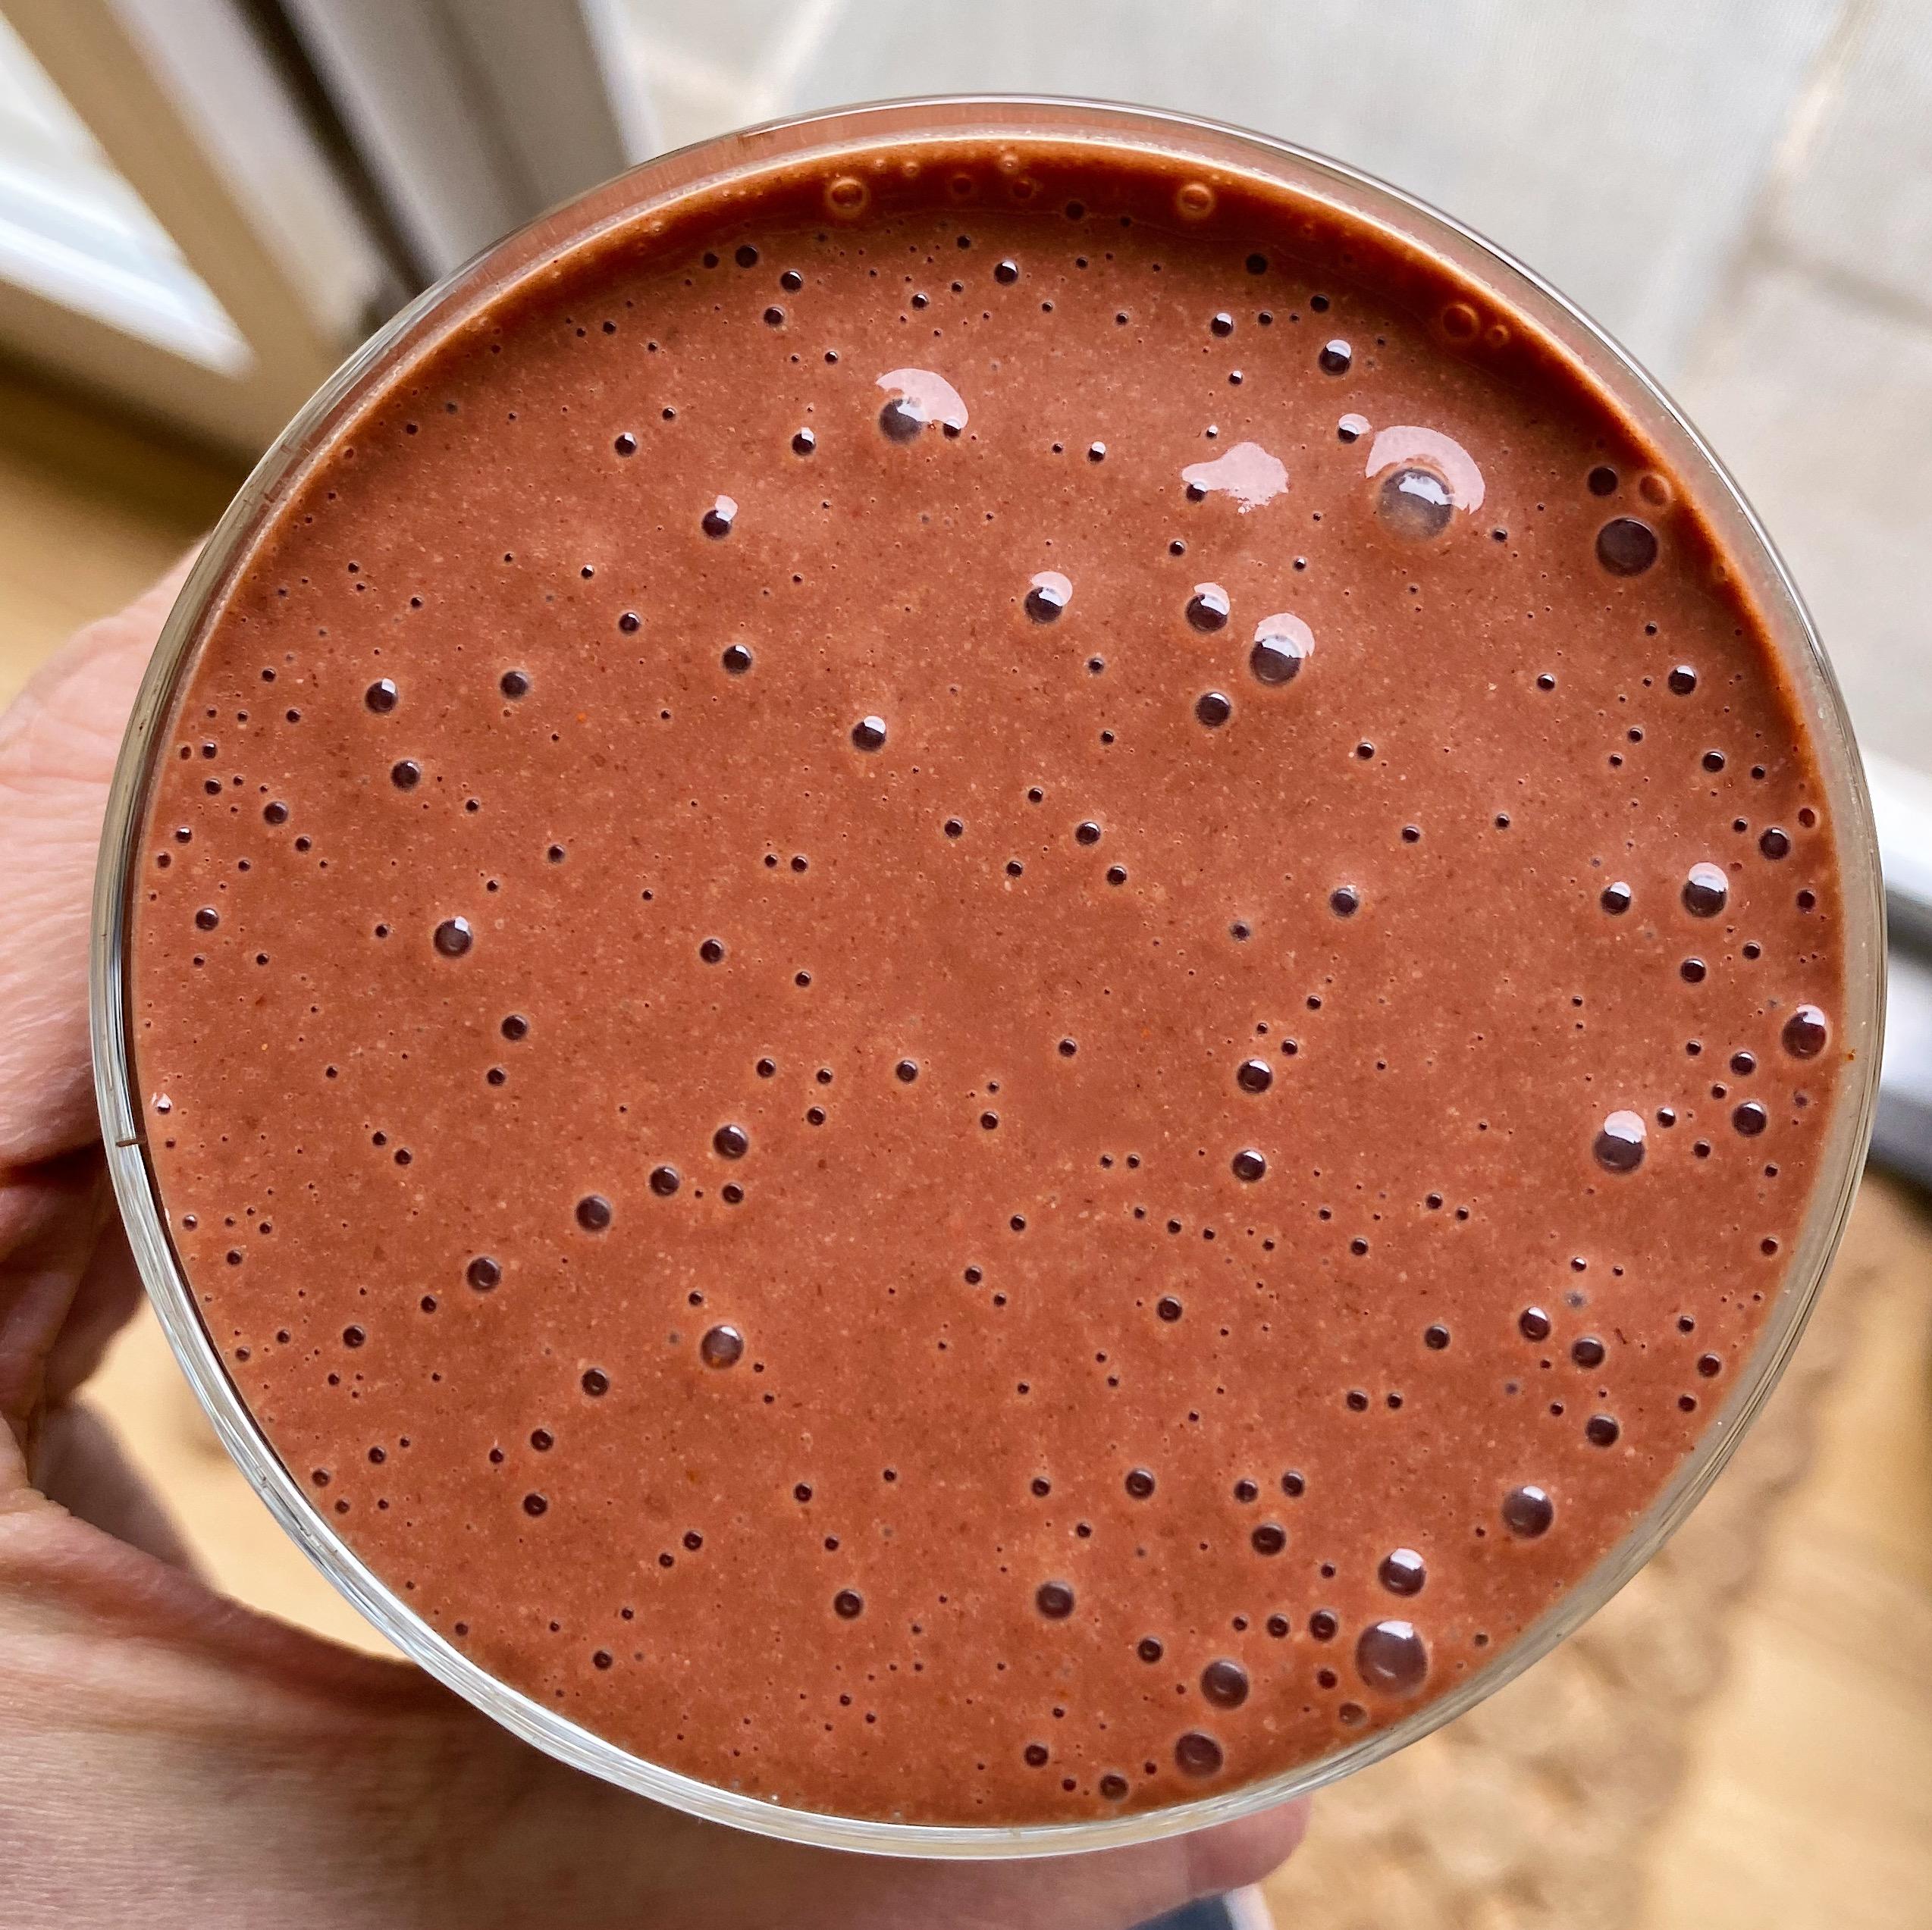 Chocolate Strawberry Smoothie gluten-free #glutenfreerecipes www.healthygffamily.com